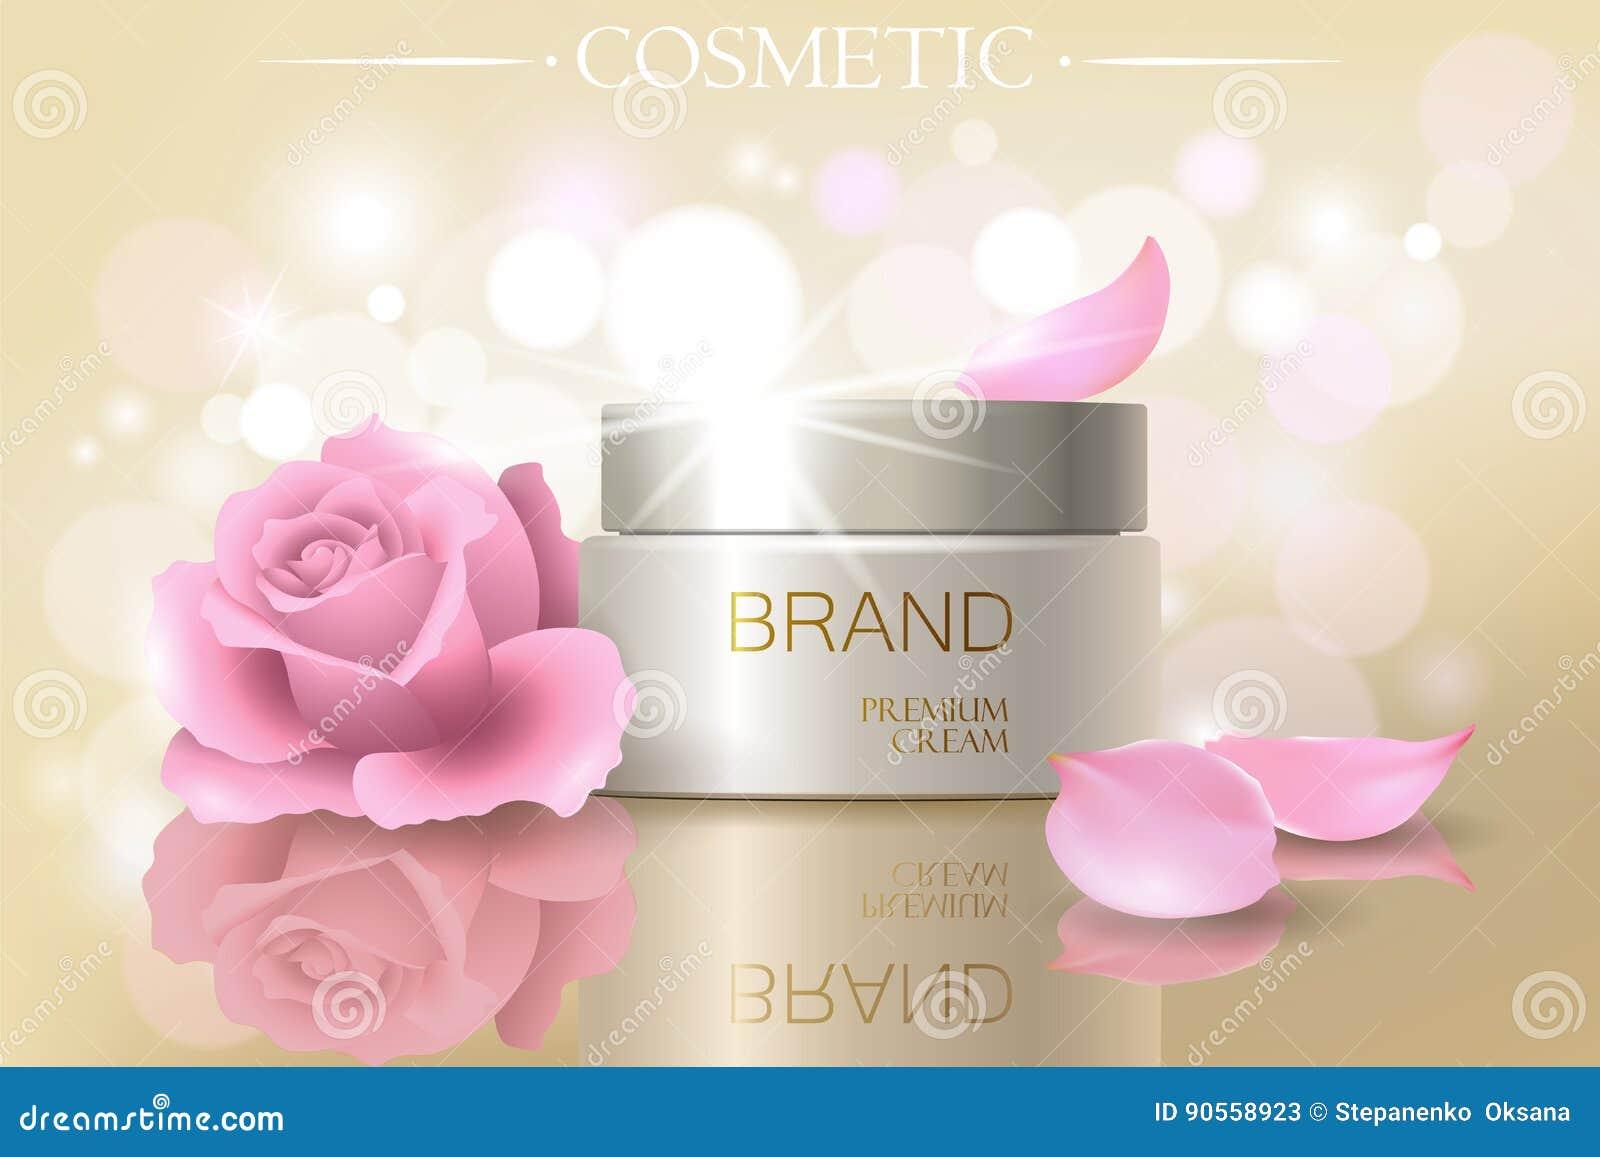 Rose petal flower extract cosmetic ads template, realistic 3D illustration skincare moisturizing mockup elegant glow